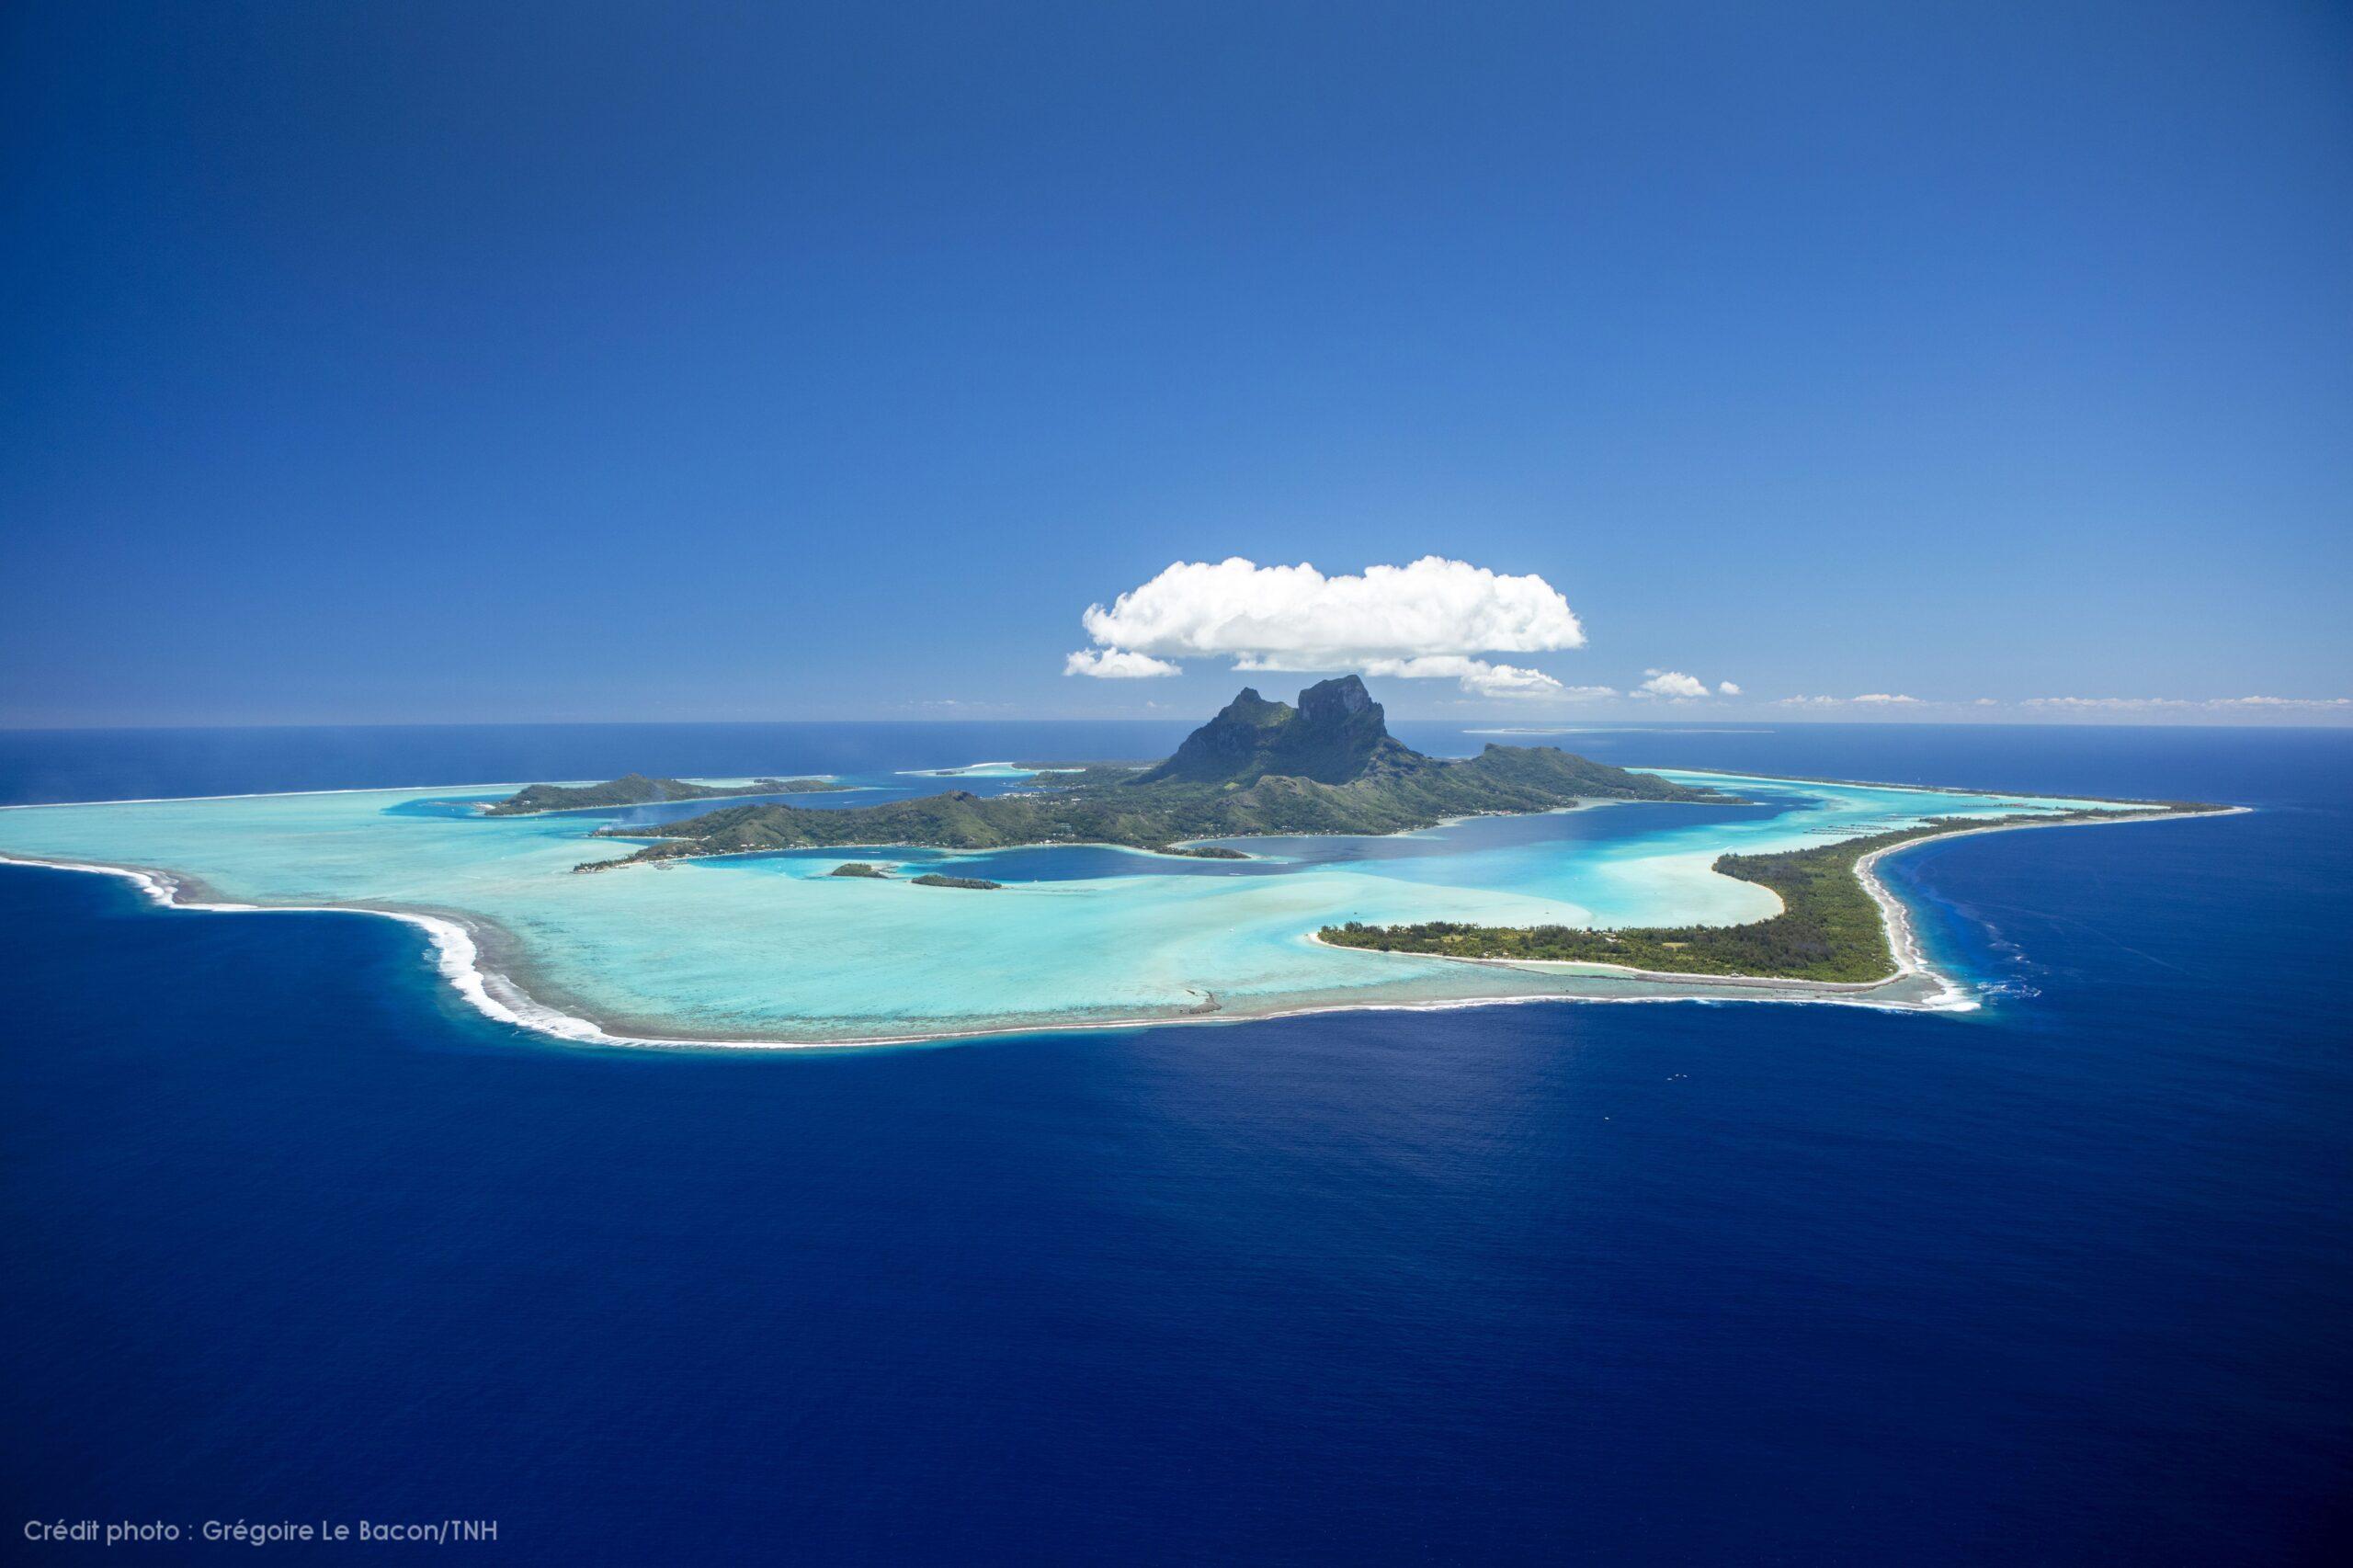 https://tahititourisme.fr/wp-content/uploads/2021/10/P2_08_BORA-BORA_Divers-TNH-87-©-Grégoire-Le-Bacon-Tahiti-Nui-Helicopters-1-scaled.jpg